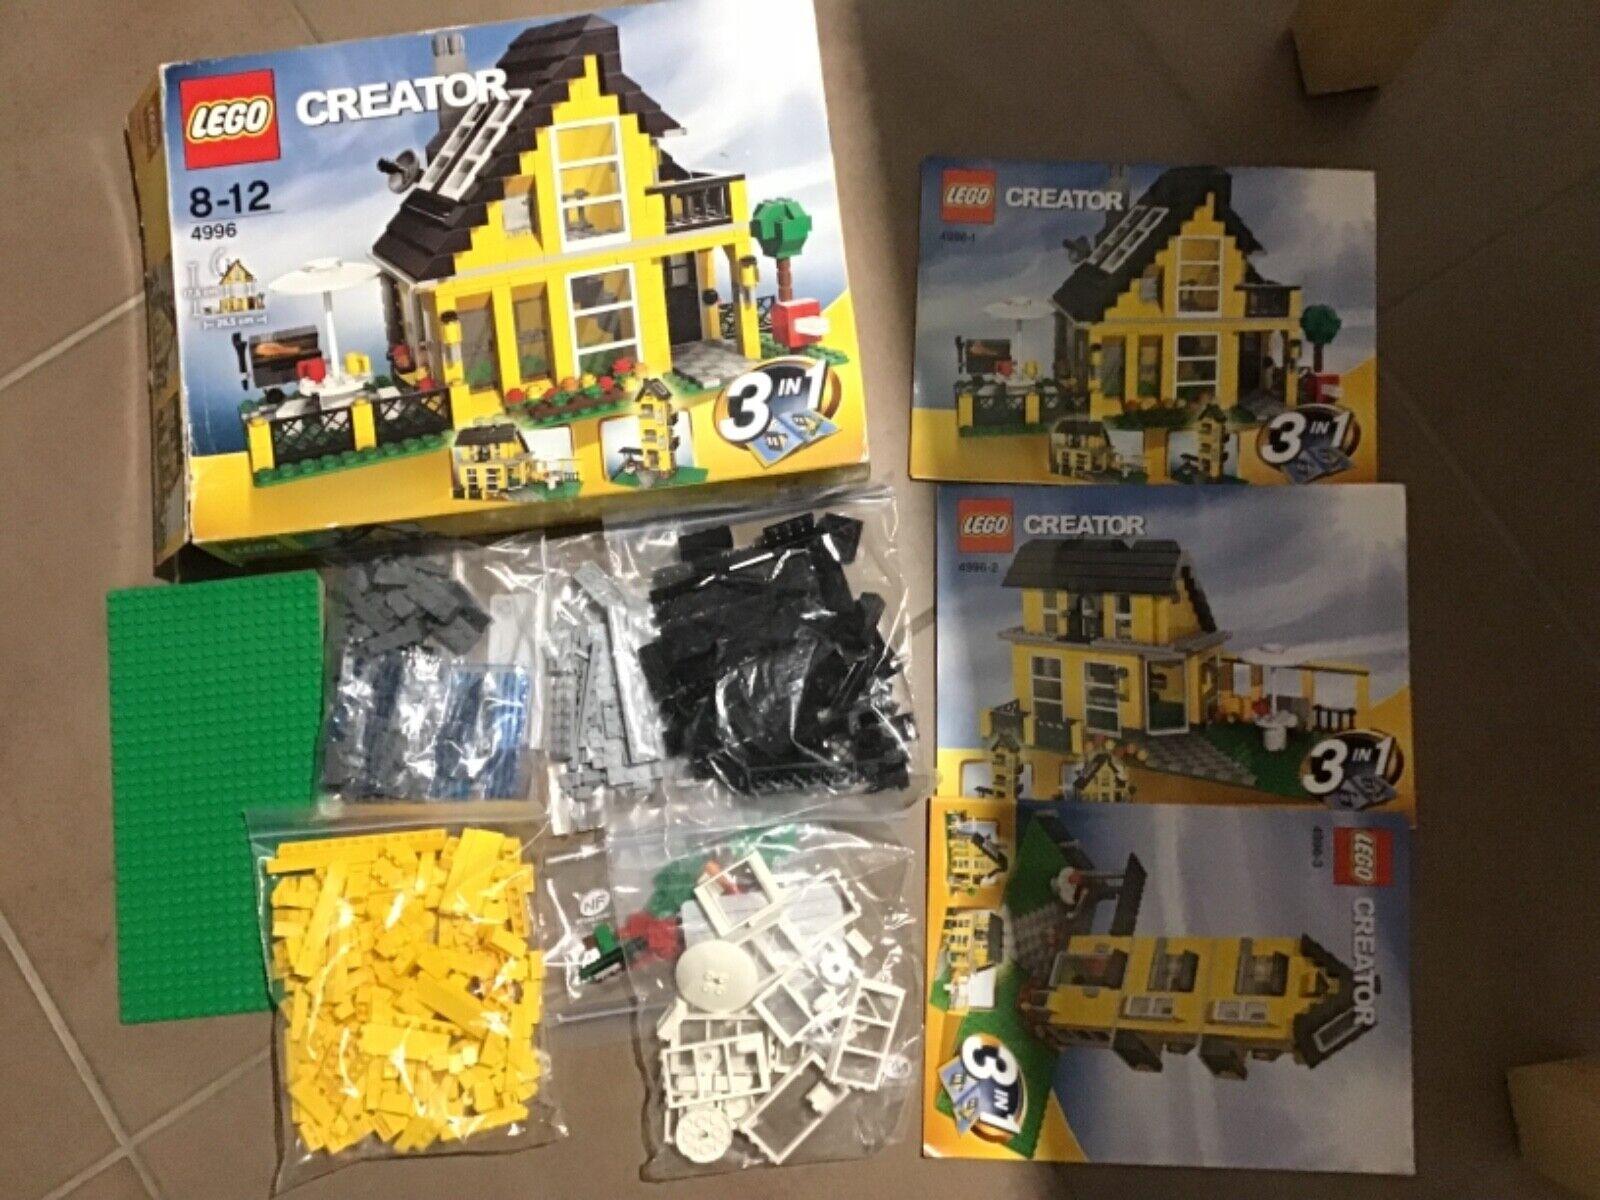 LEGO CREATOR n°4996. COMPLET